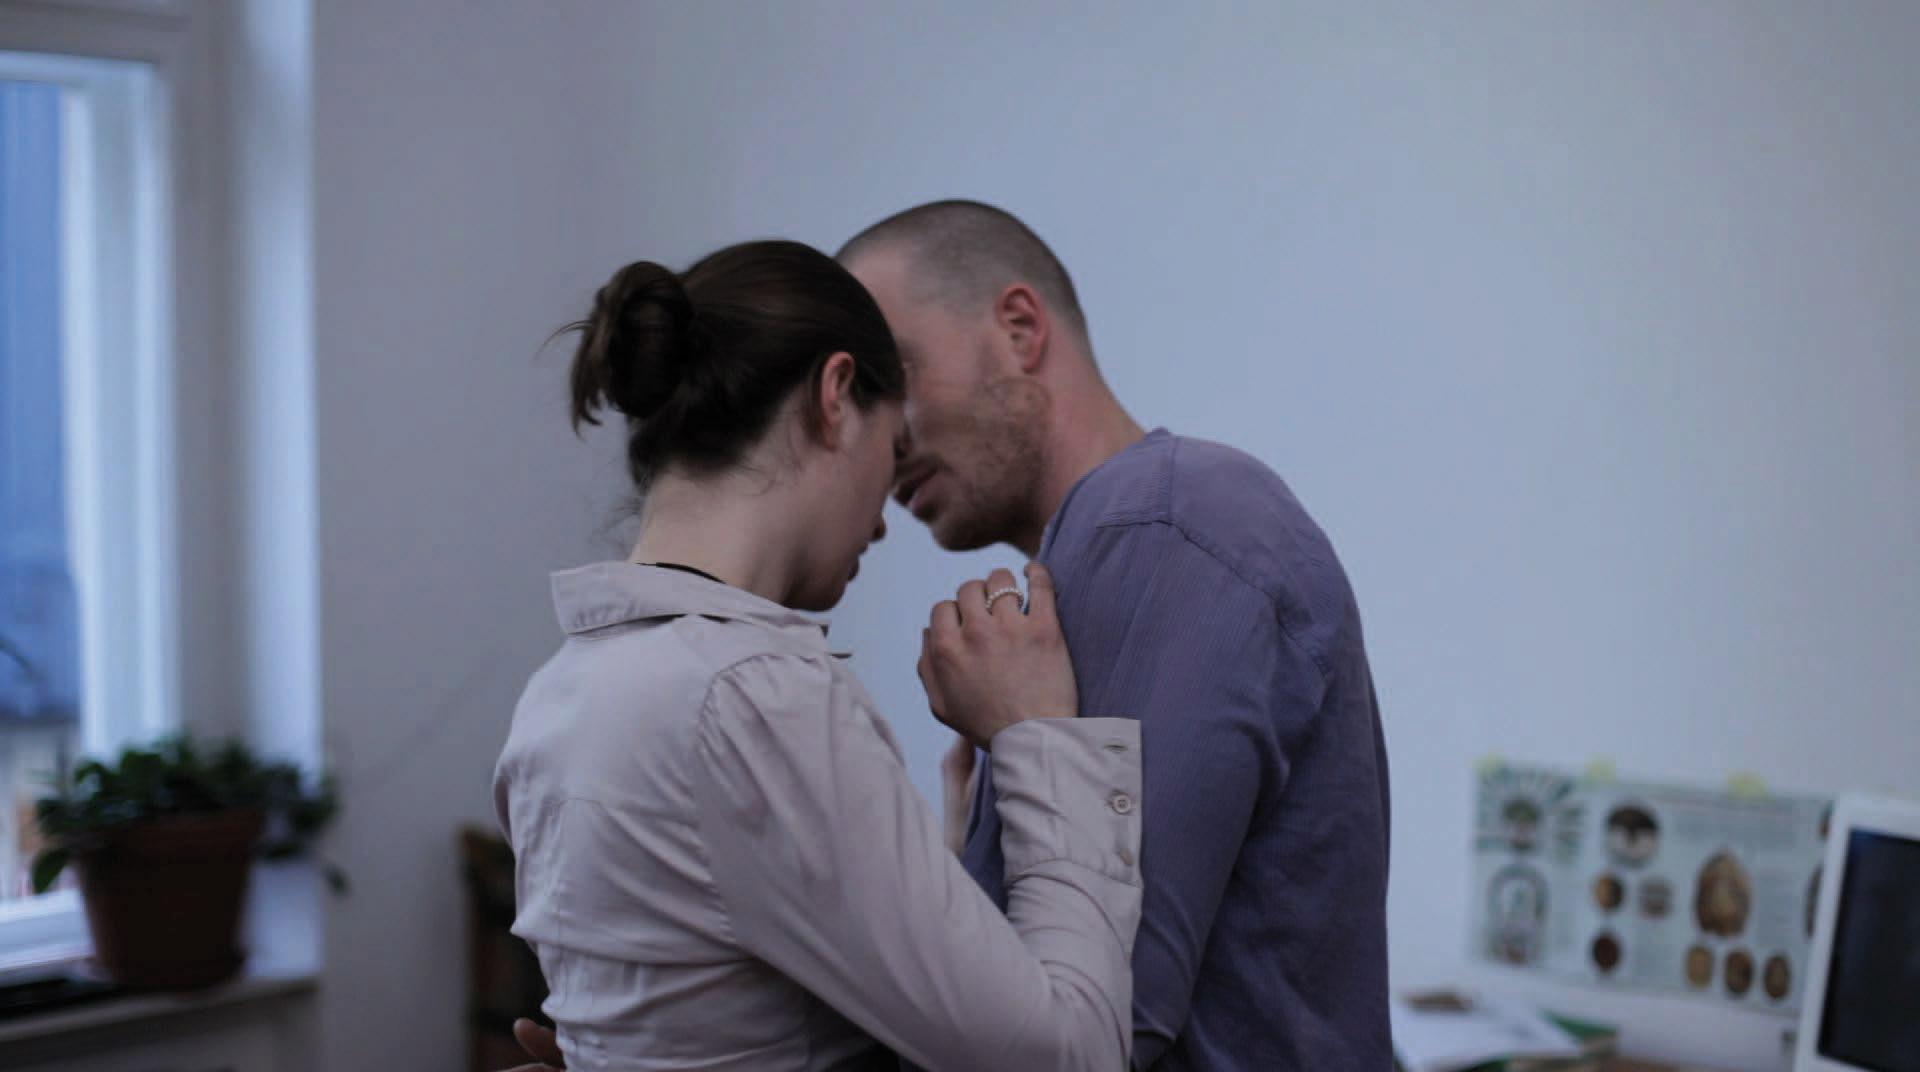 Sophie-Salzer_WEB-SUITE,-Episode-ALLEMANDE,-2014-22-min